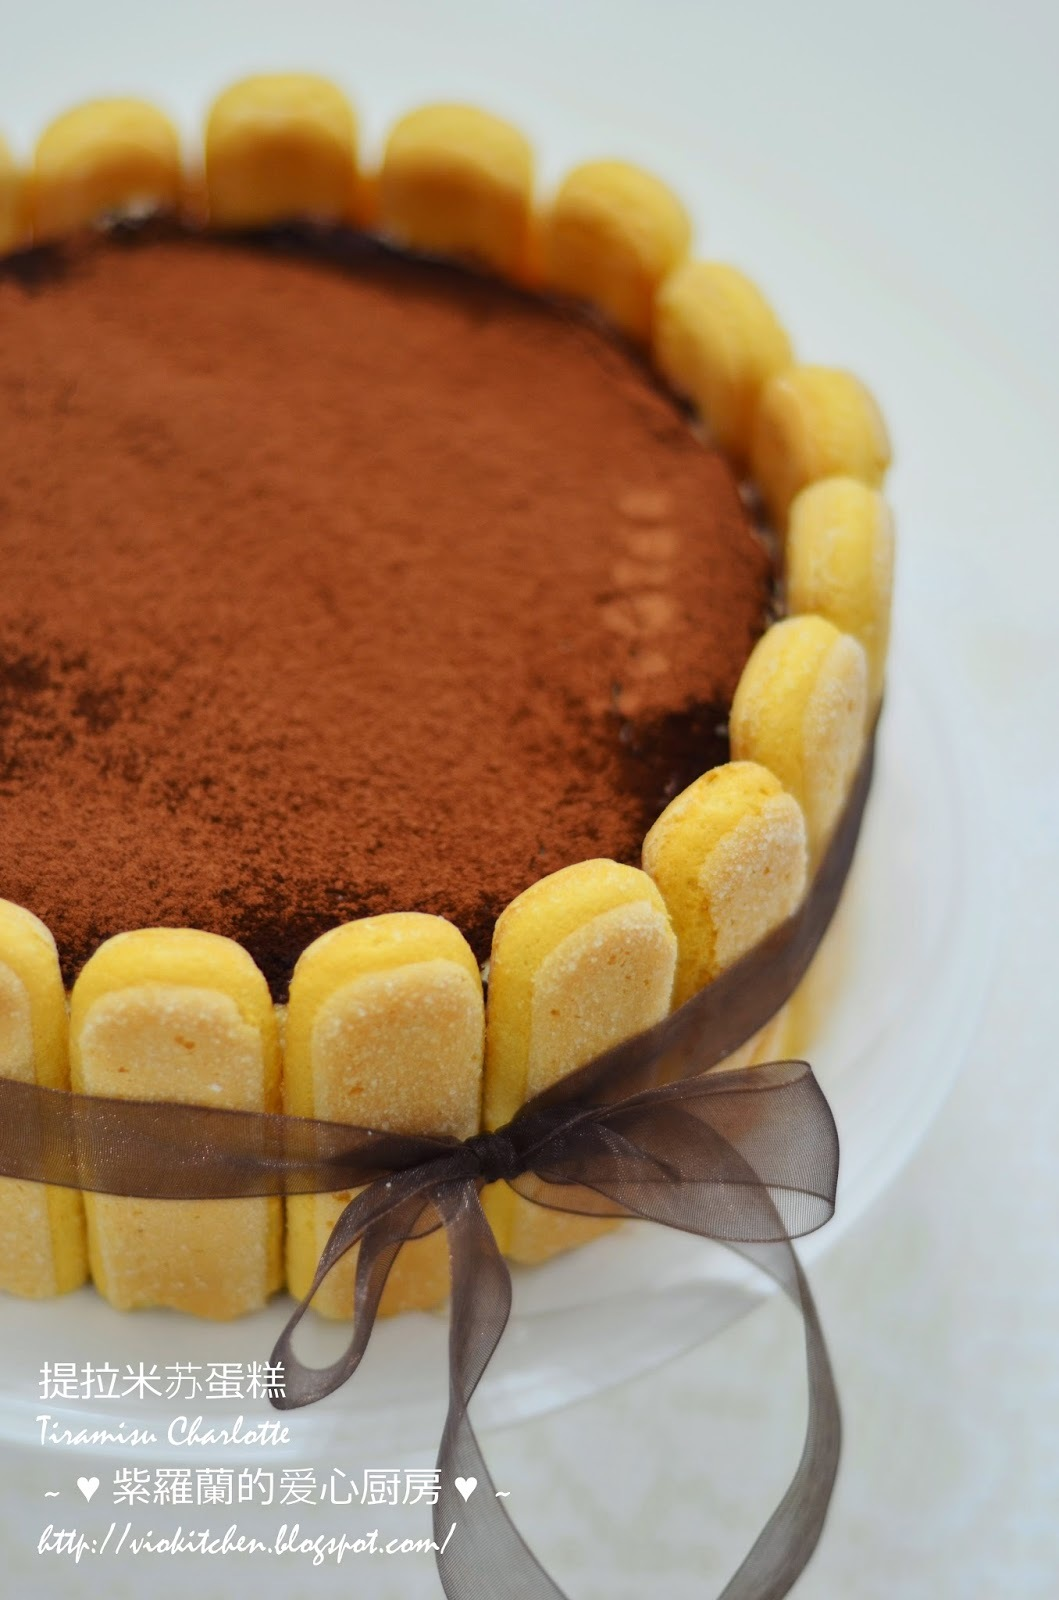 提拉米苏蛋糕 Tiramisu Charlotte / 生日 Birthday 2014